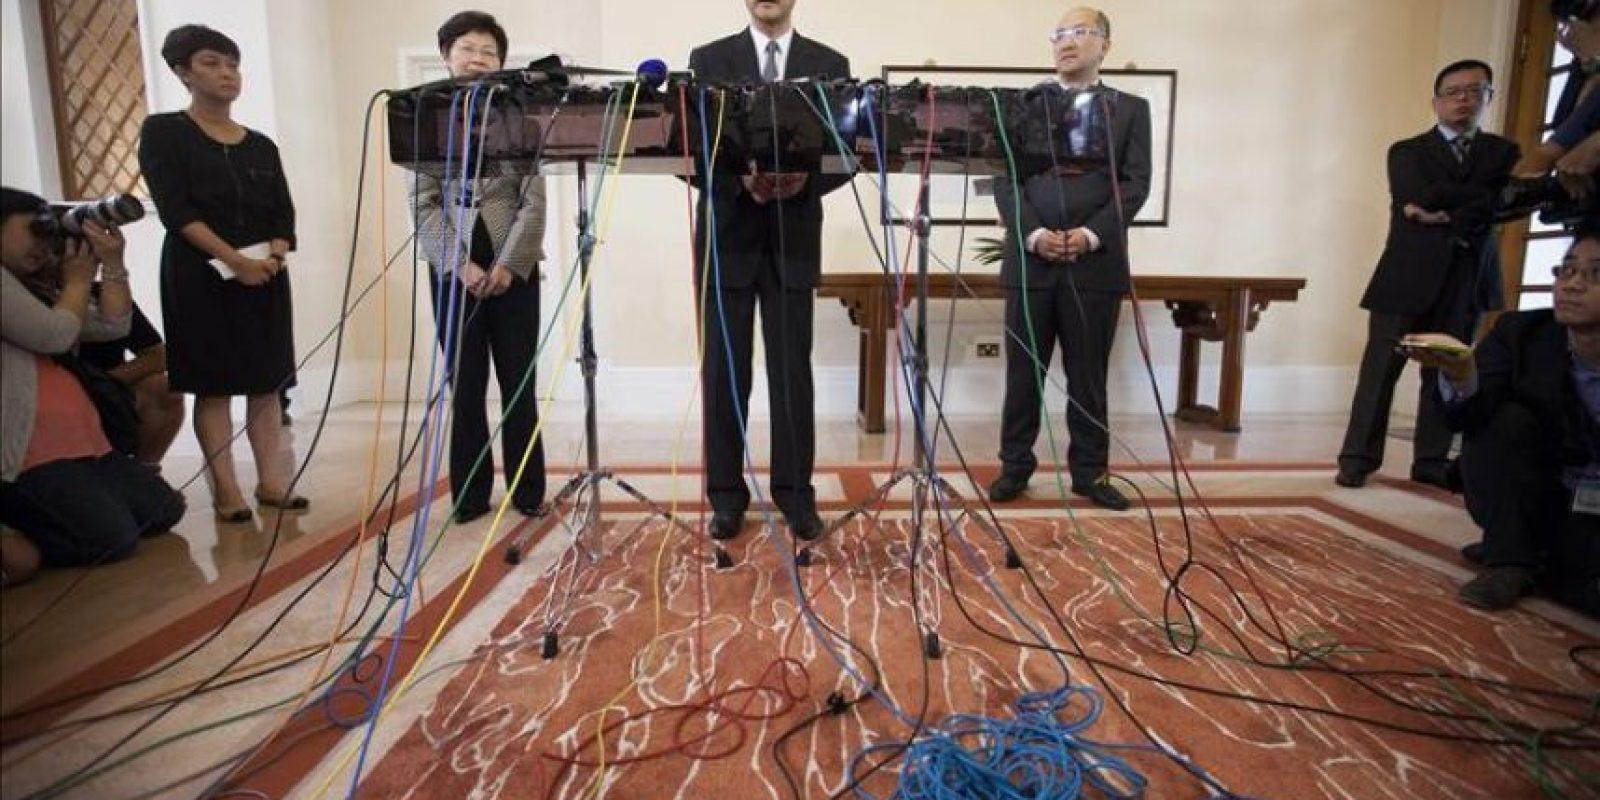 El jefe de administración de Hong Kong, Carrie Lam-yuet ngor (izda), el jefe del Ejecutivo de Hong Kong, Leung Chun-ying (centro), el secretario de Hong Kong para Asuntos Constitucionales y la Zona Continental, Raymond Tam (dcha), ofrecen una rueda de prensa en Hong Kong (China). EFE